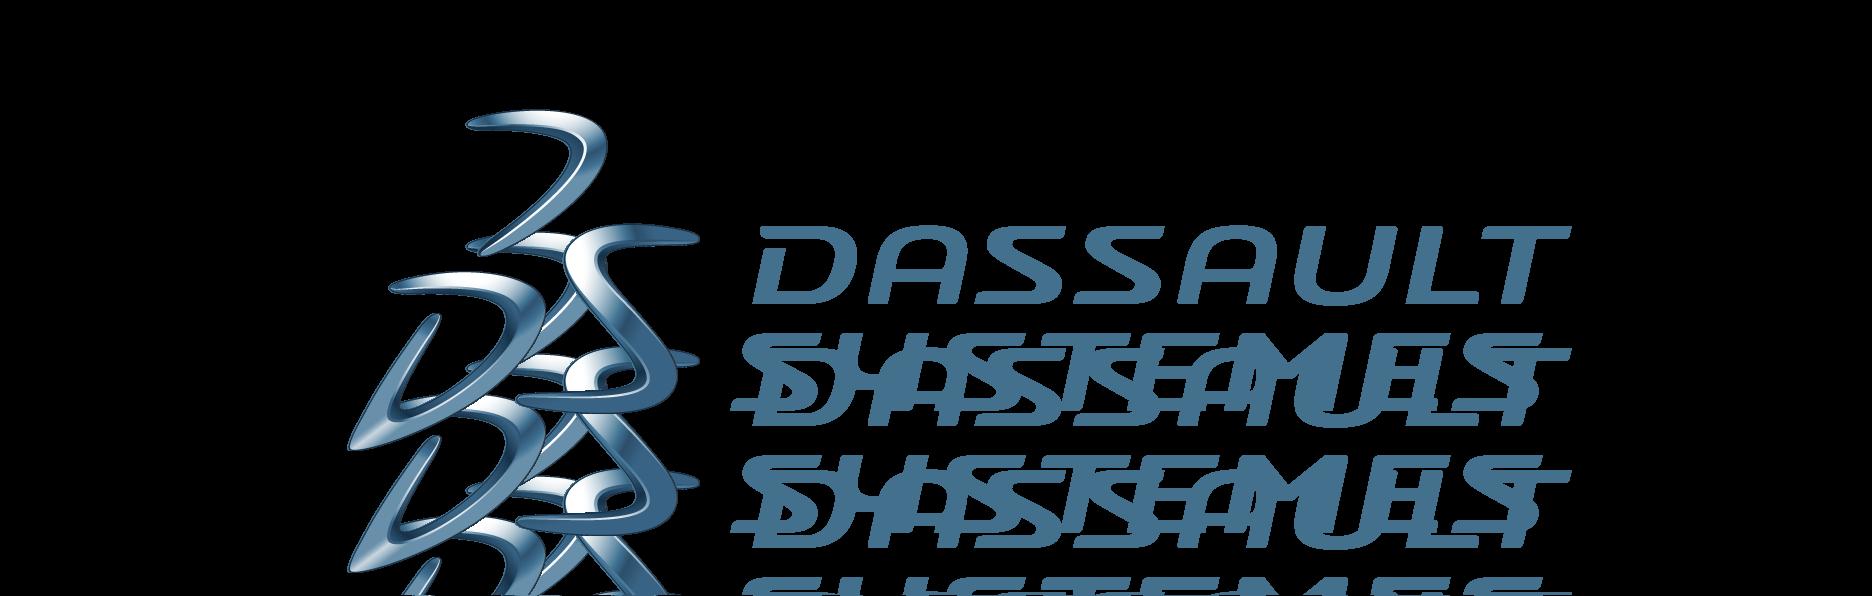 Dassault Systemes Catia logo